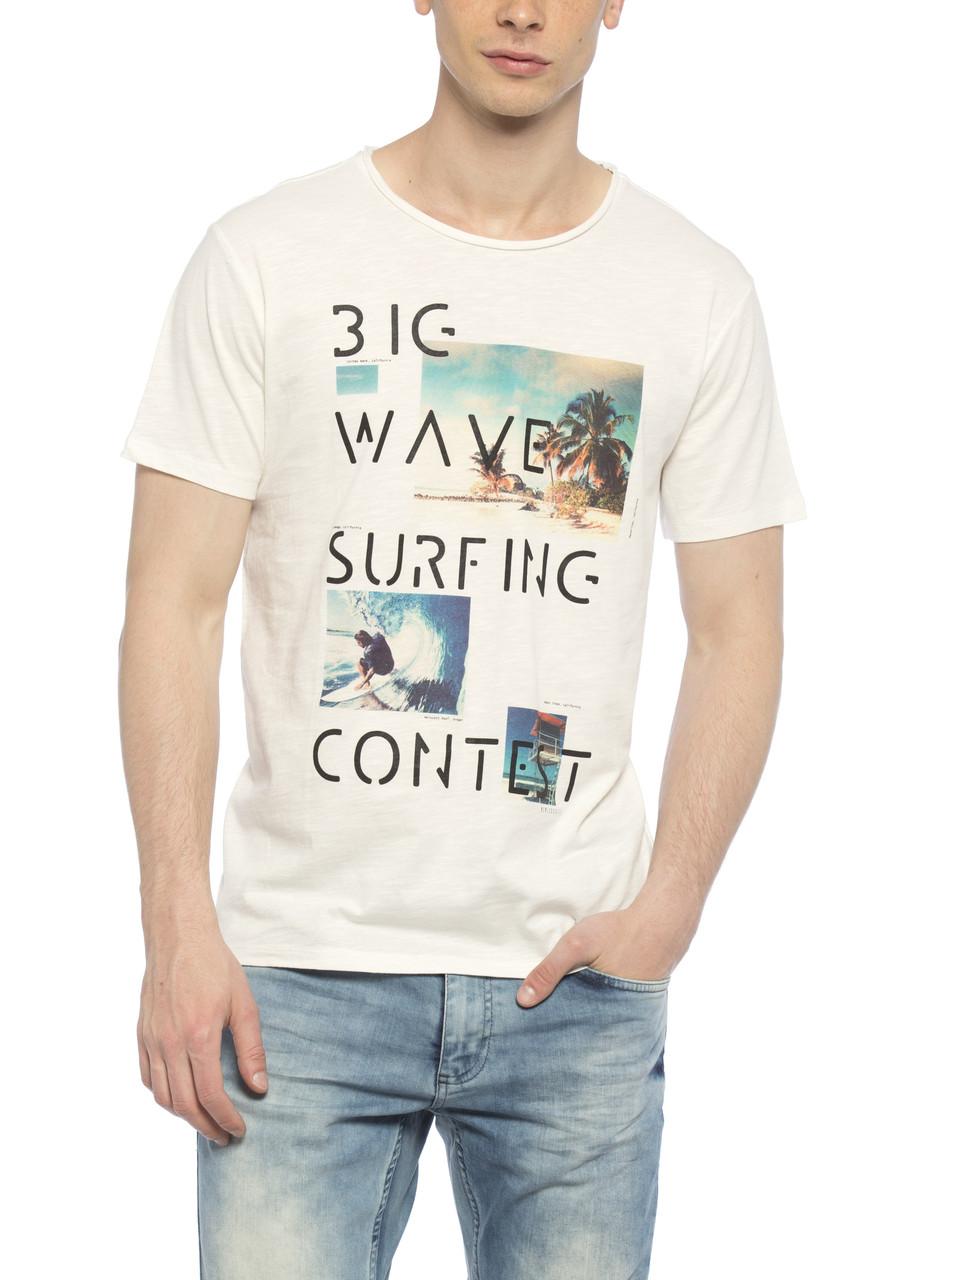 Мужская футболка LC Waikiki / ЛС Вайкики с надписью Big wave Surfing contest